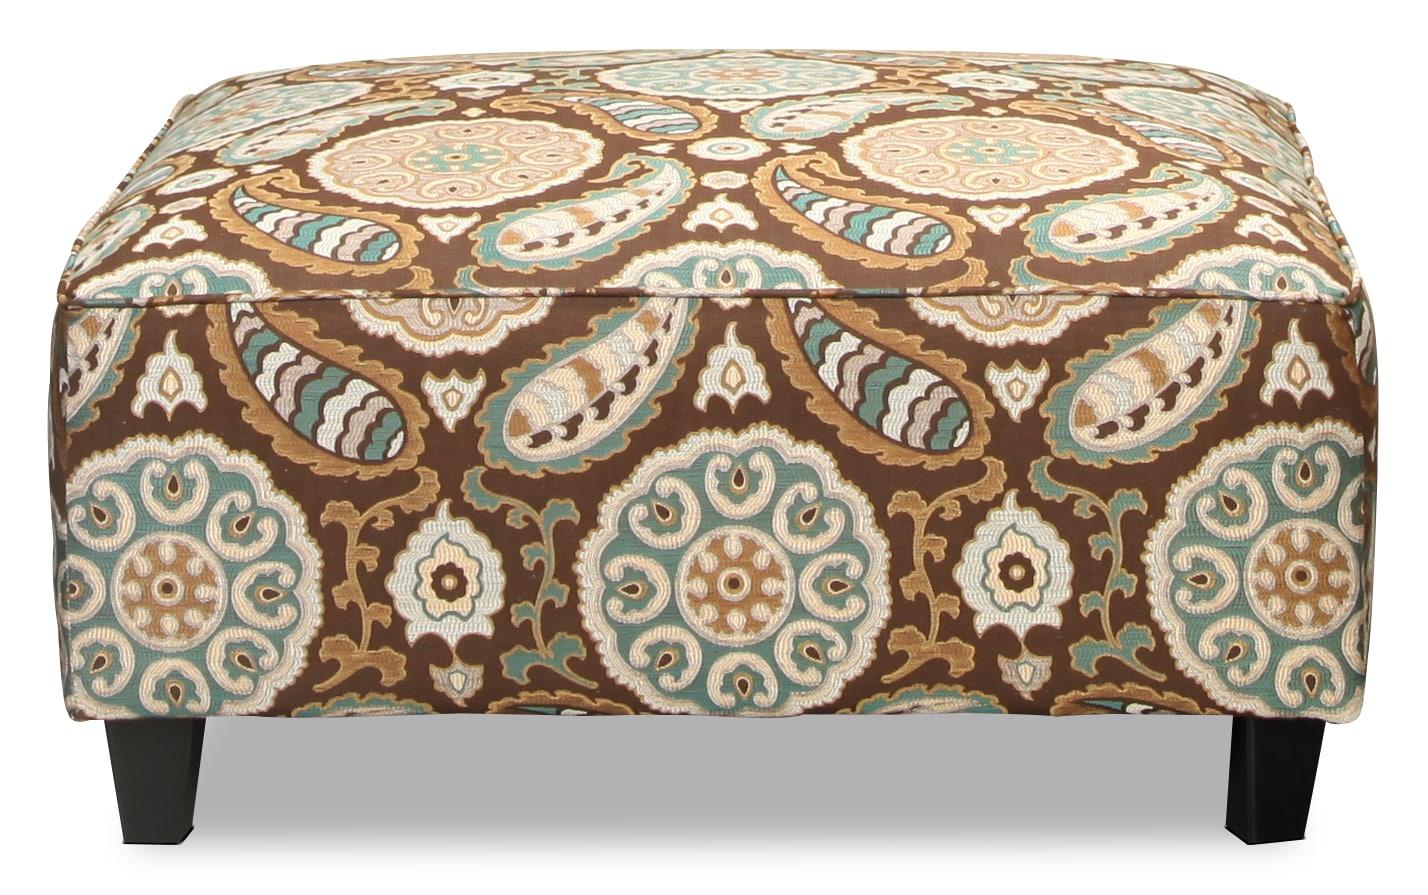 Living Room Furniture - Brookside Cocktail Ottoman